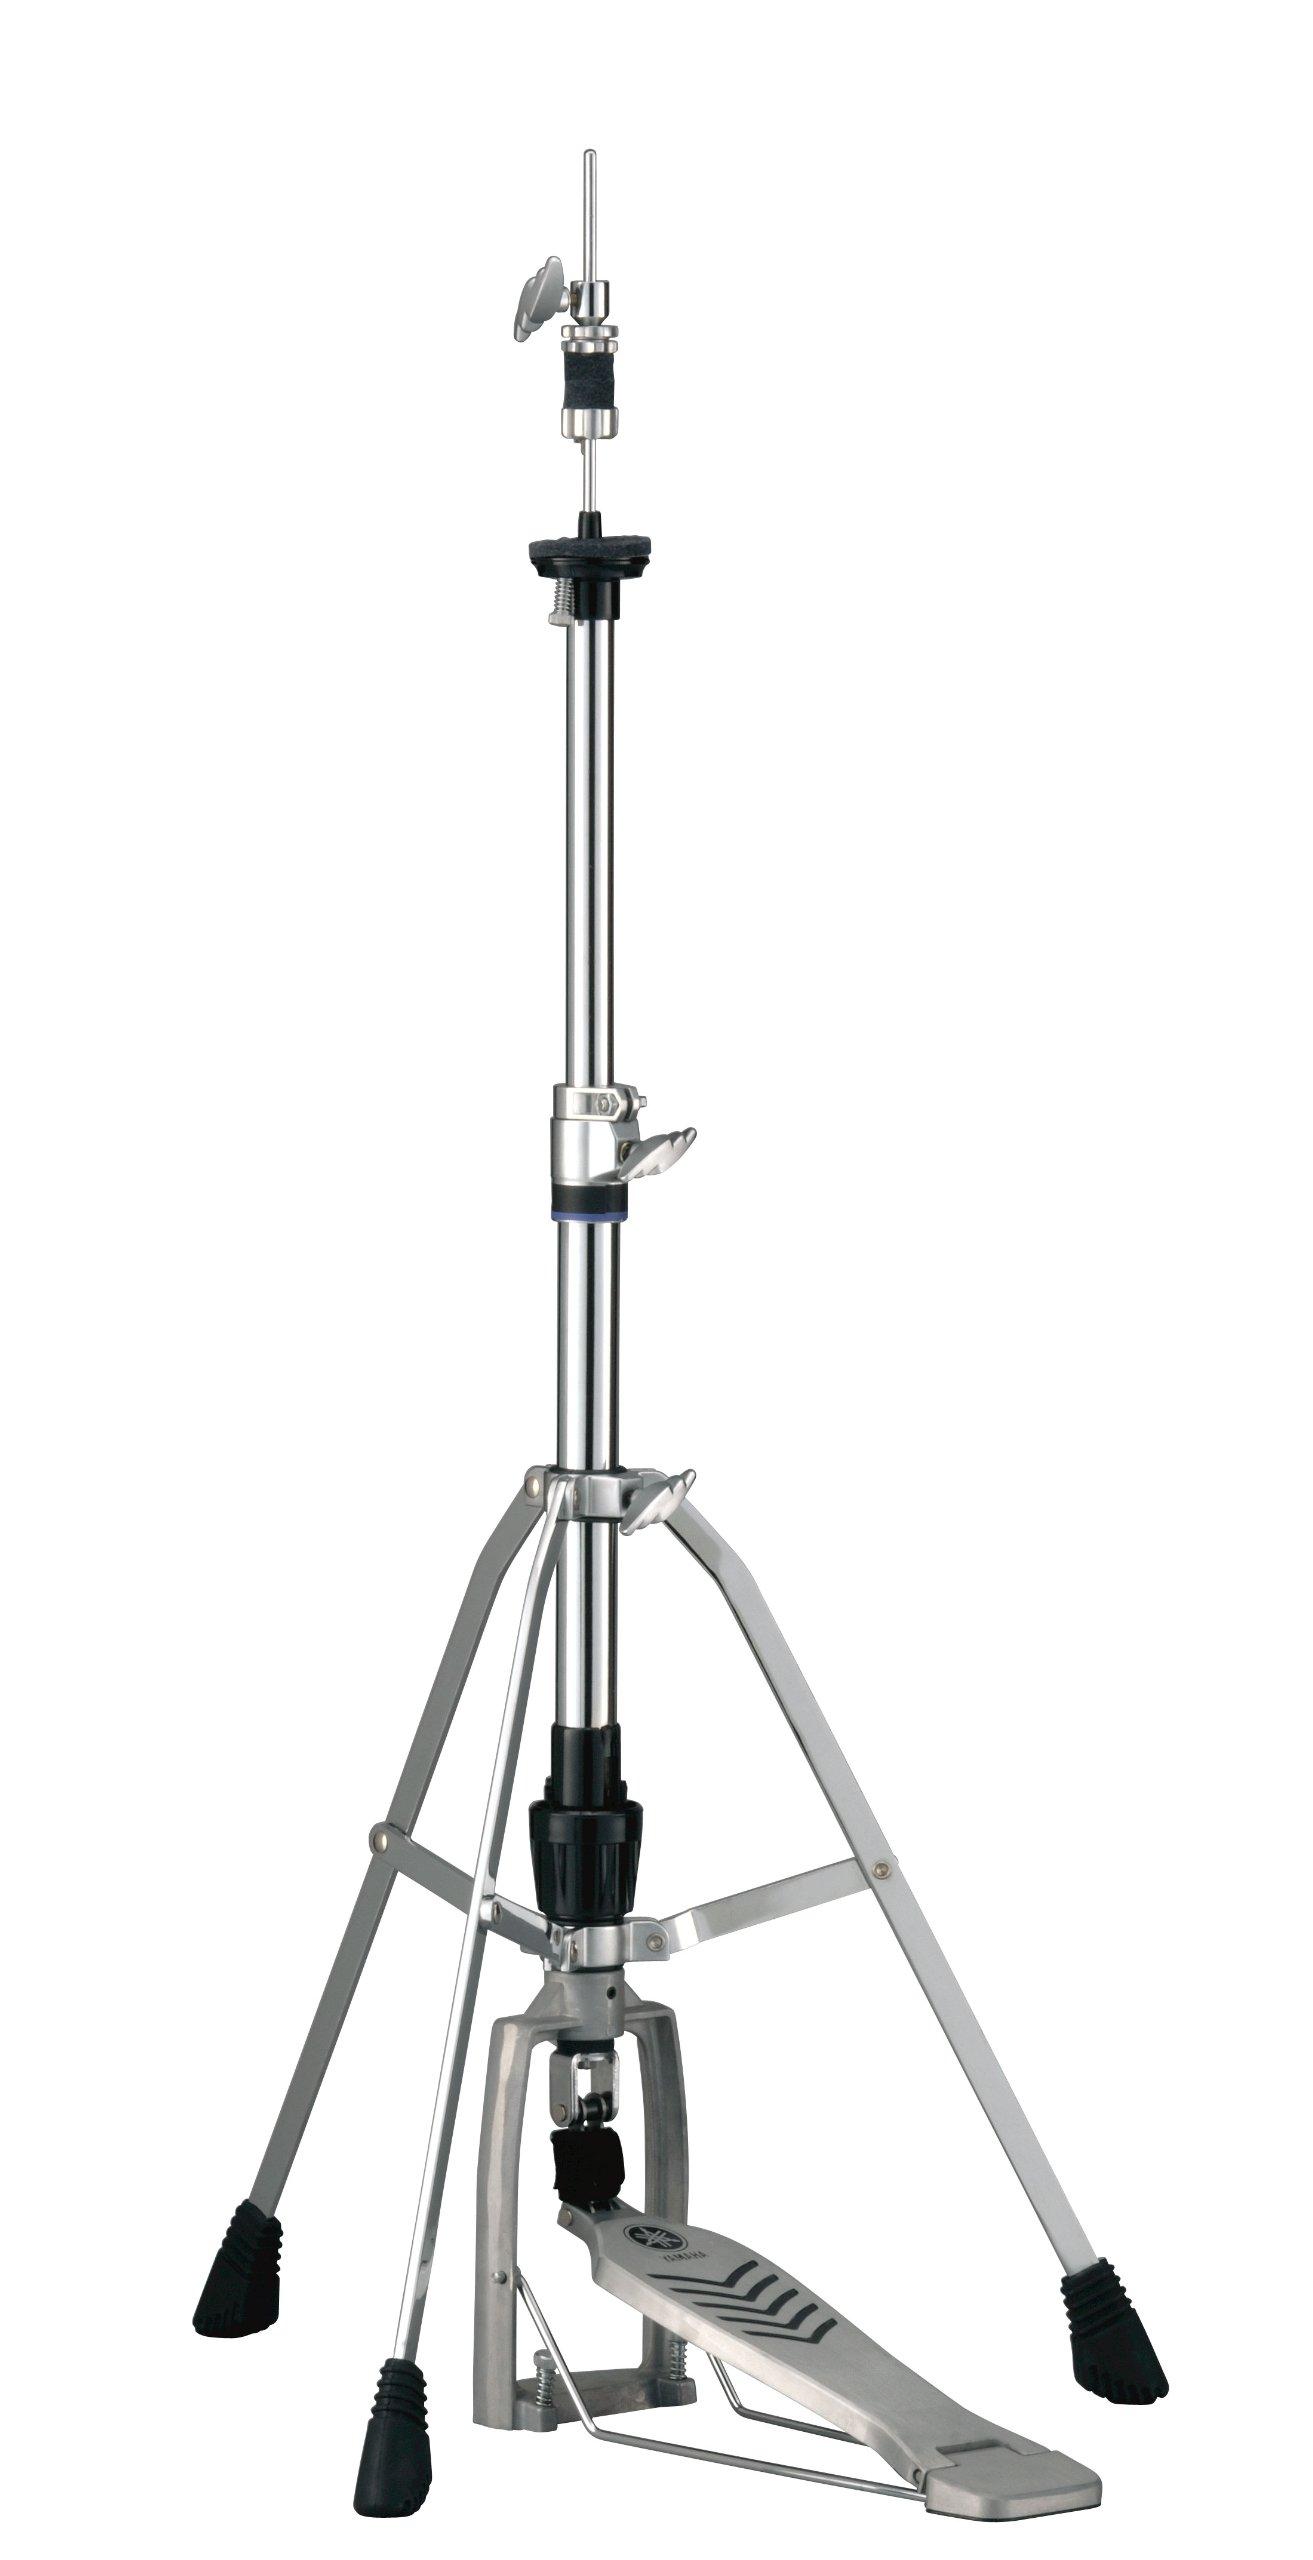 Yamaha HS-740A Hi-Hat Stand - Medium Weight, 700 Series